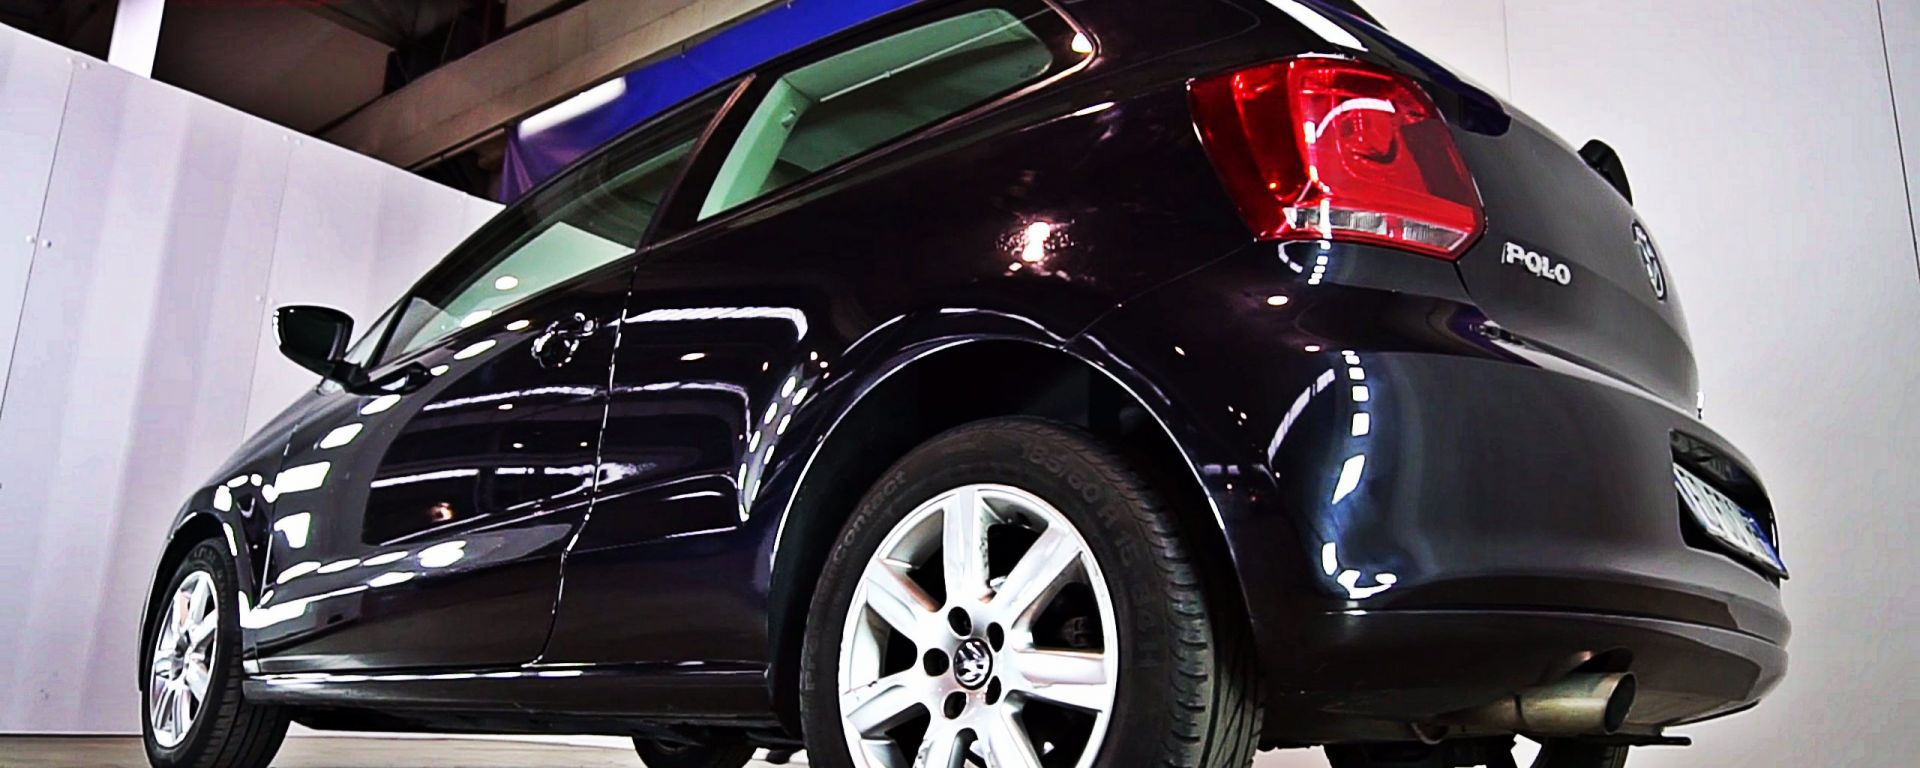 Volkswagen Polo: Check Up Usato [Video]